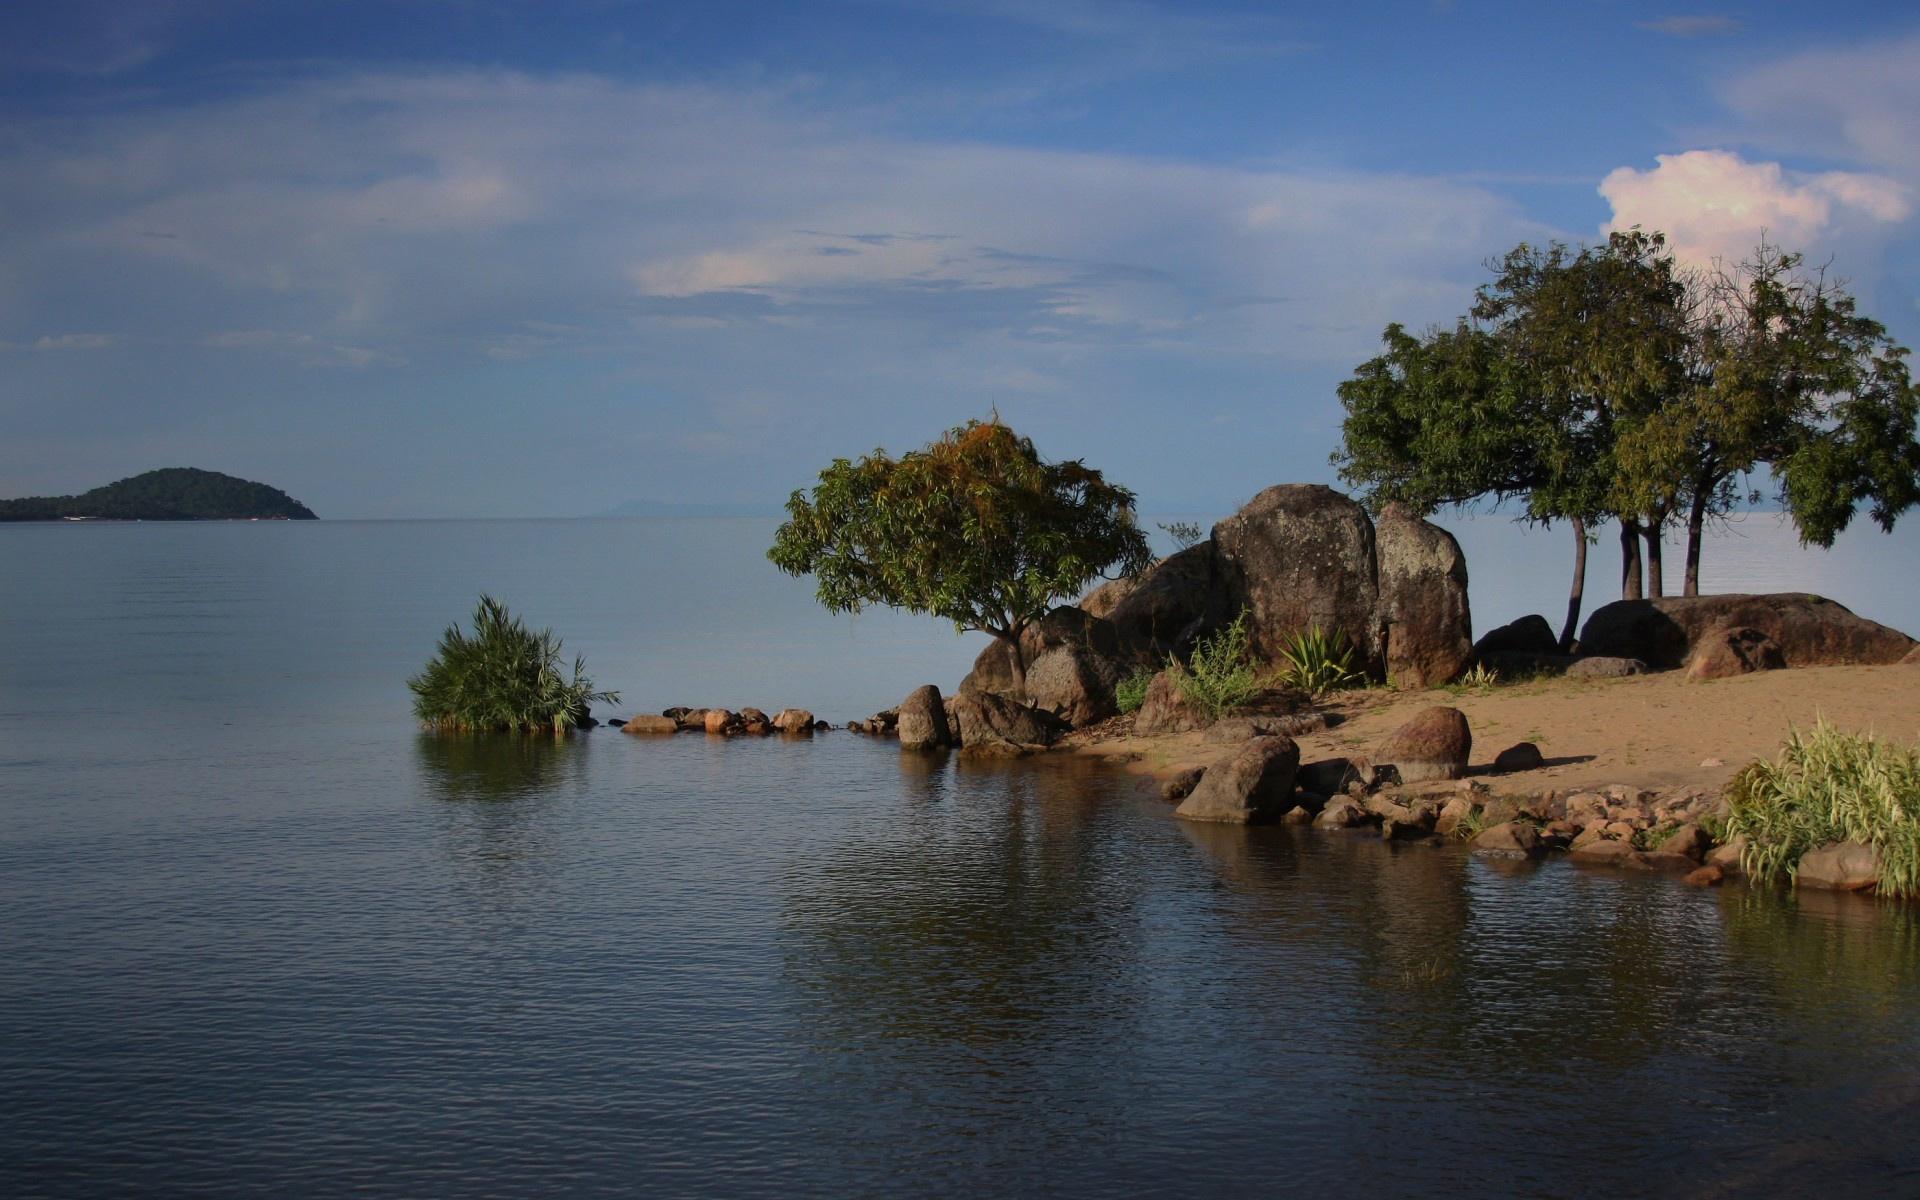 Lac Malawi, Malawi